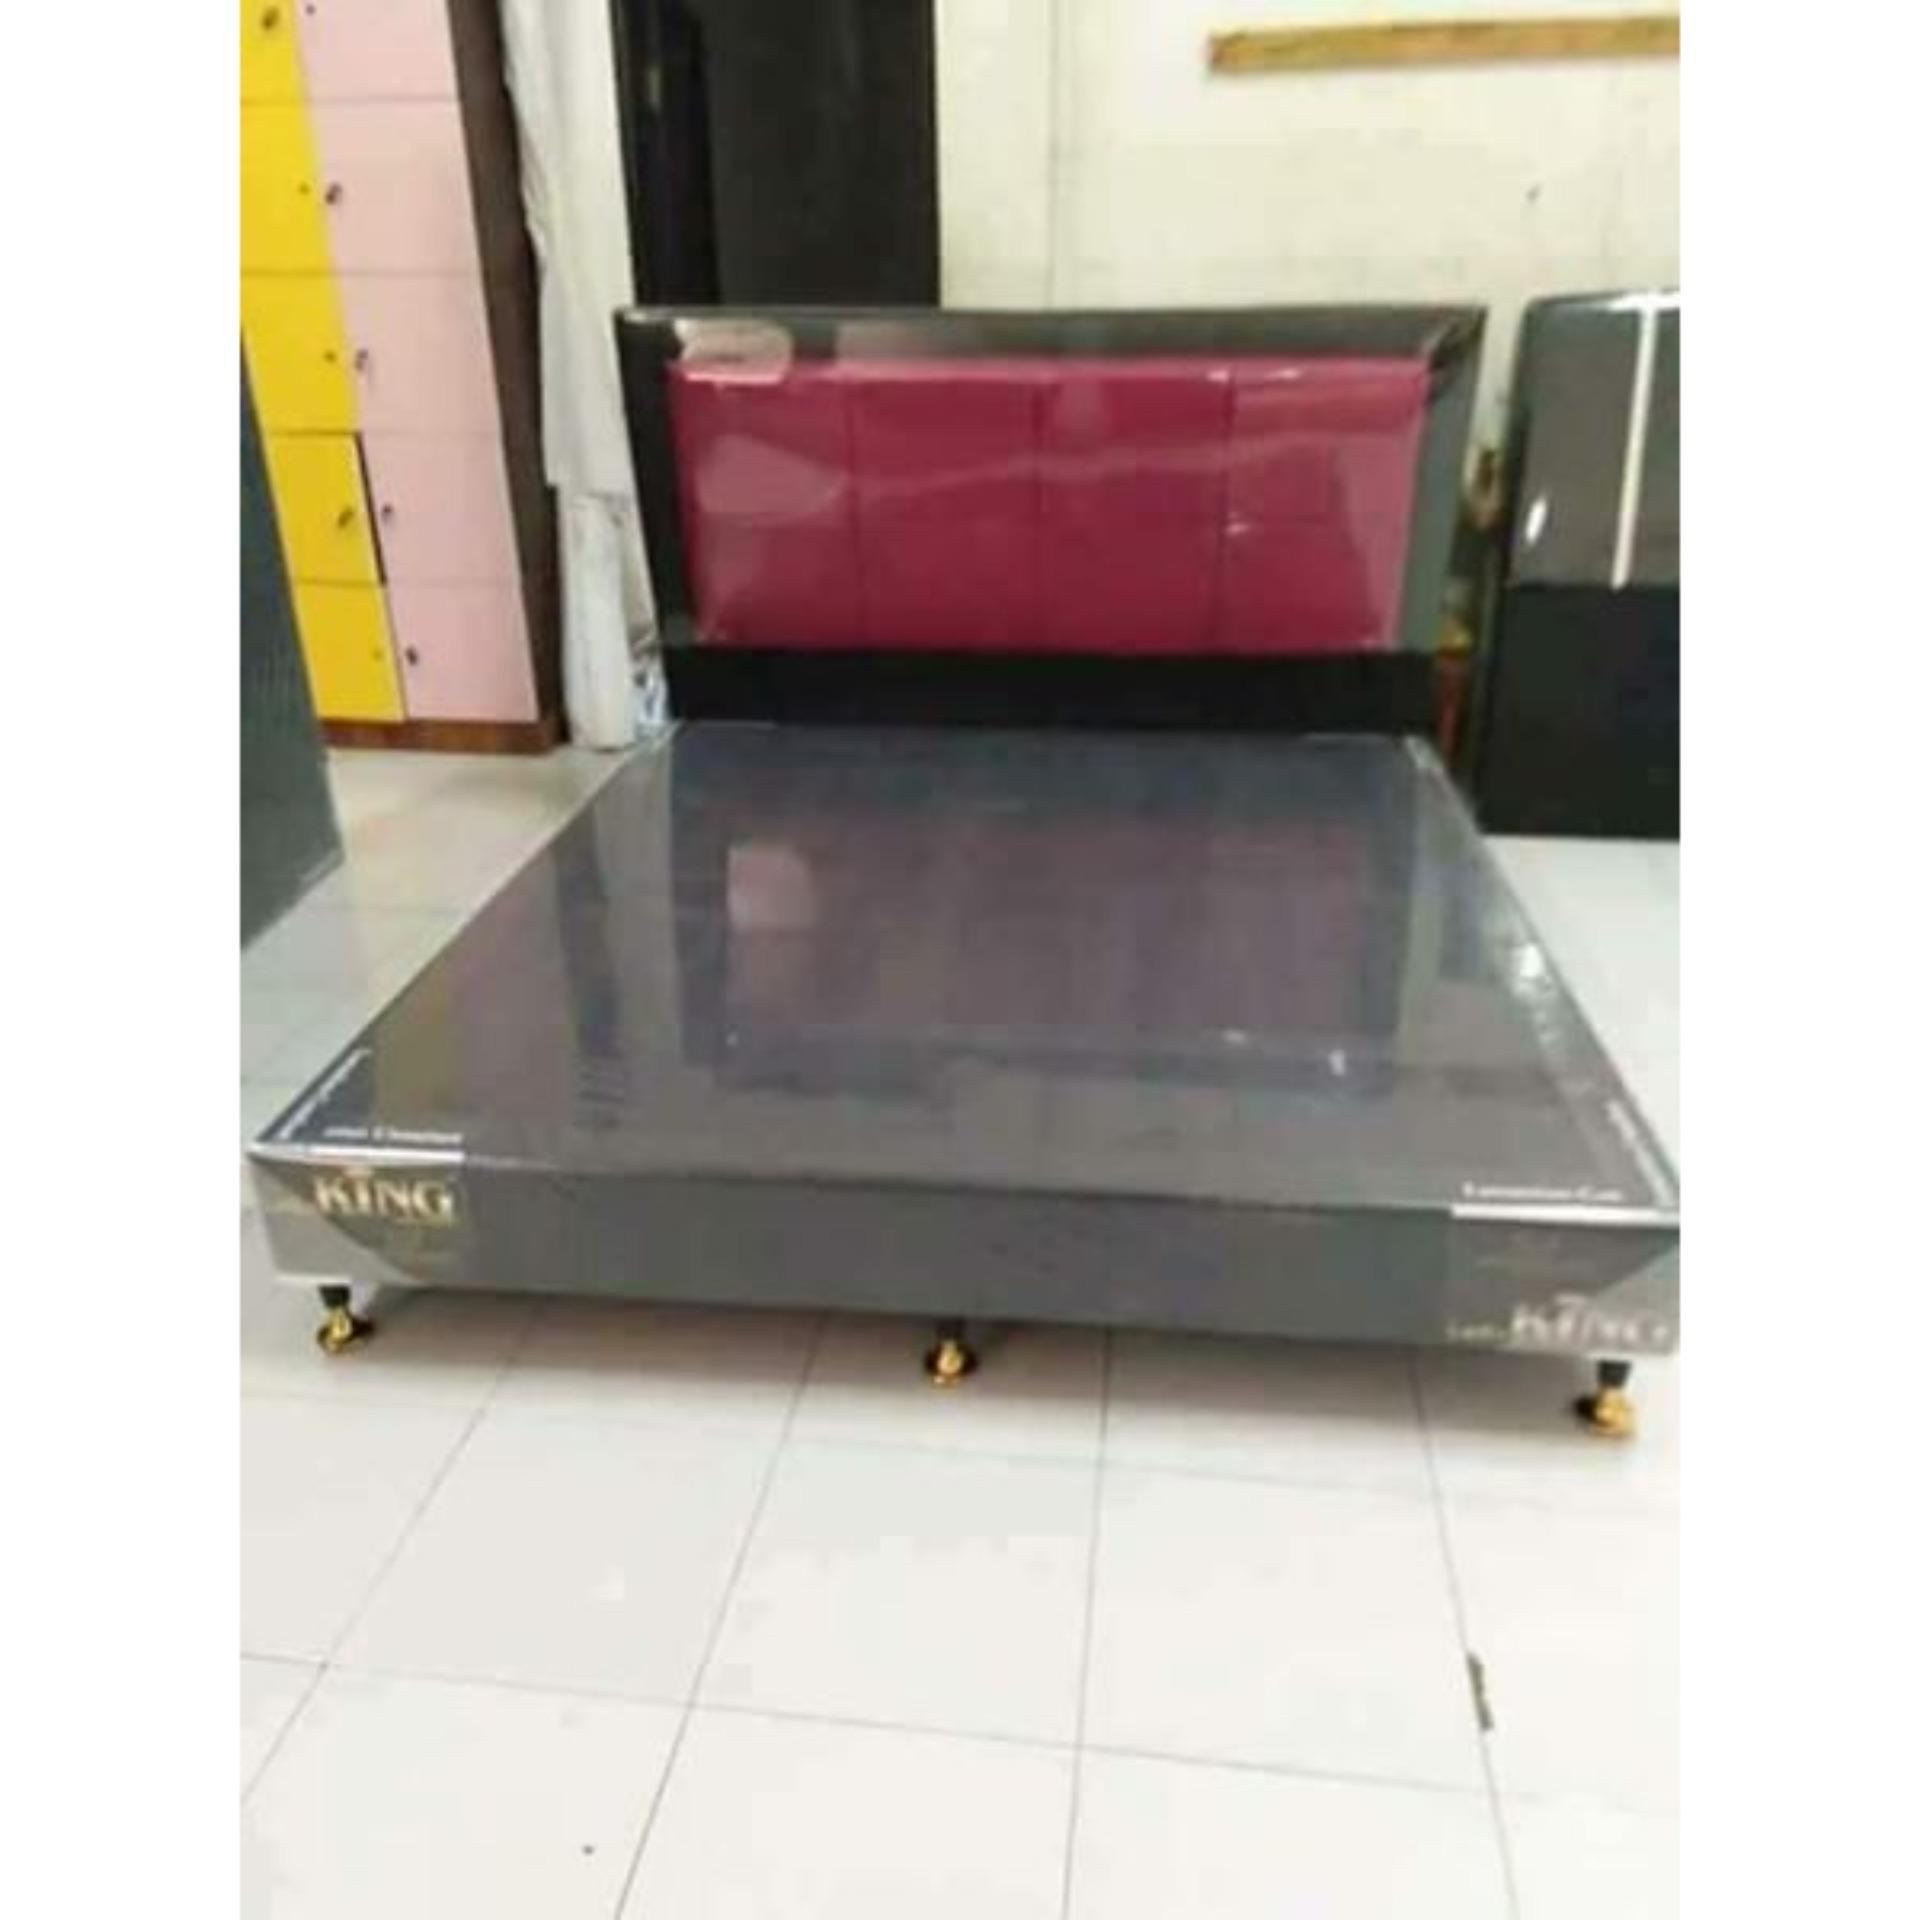 Buy Sell Cheapest Dipan Murah Dan Best Quality Product Deals Sky Divan Headboard Sandaran Kasur Springbed Ukuran 160x200 Latex King 004